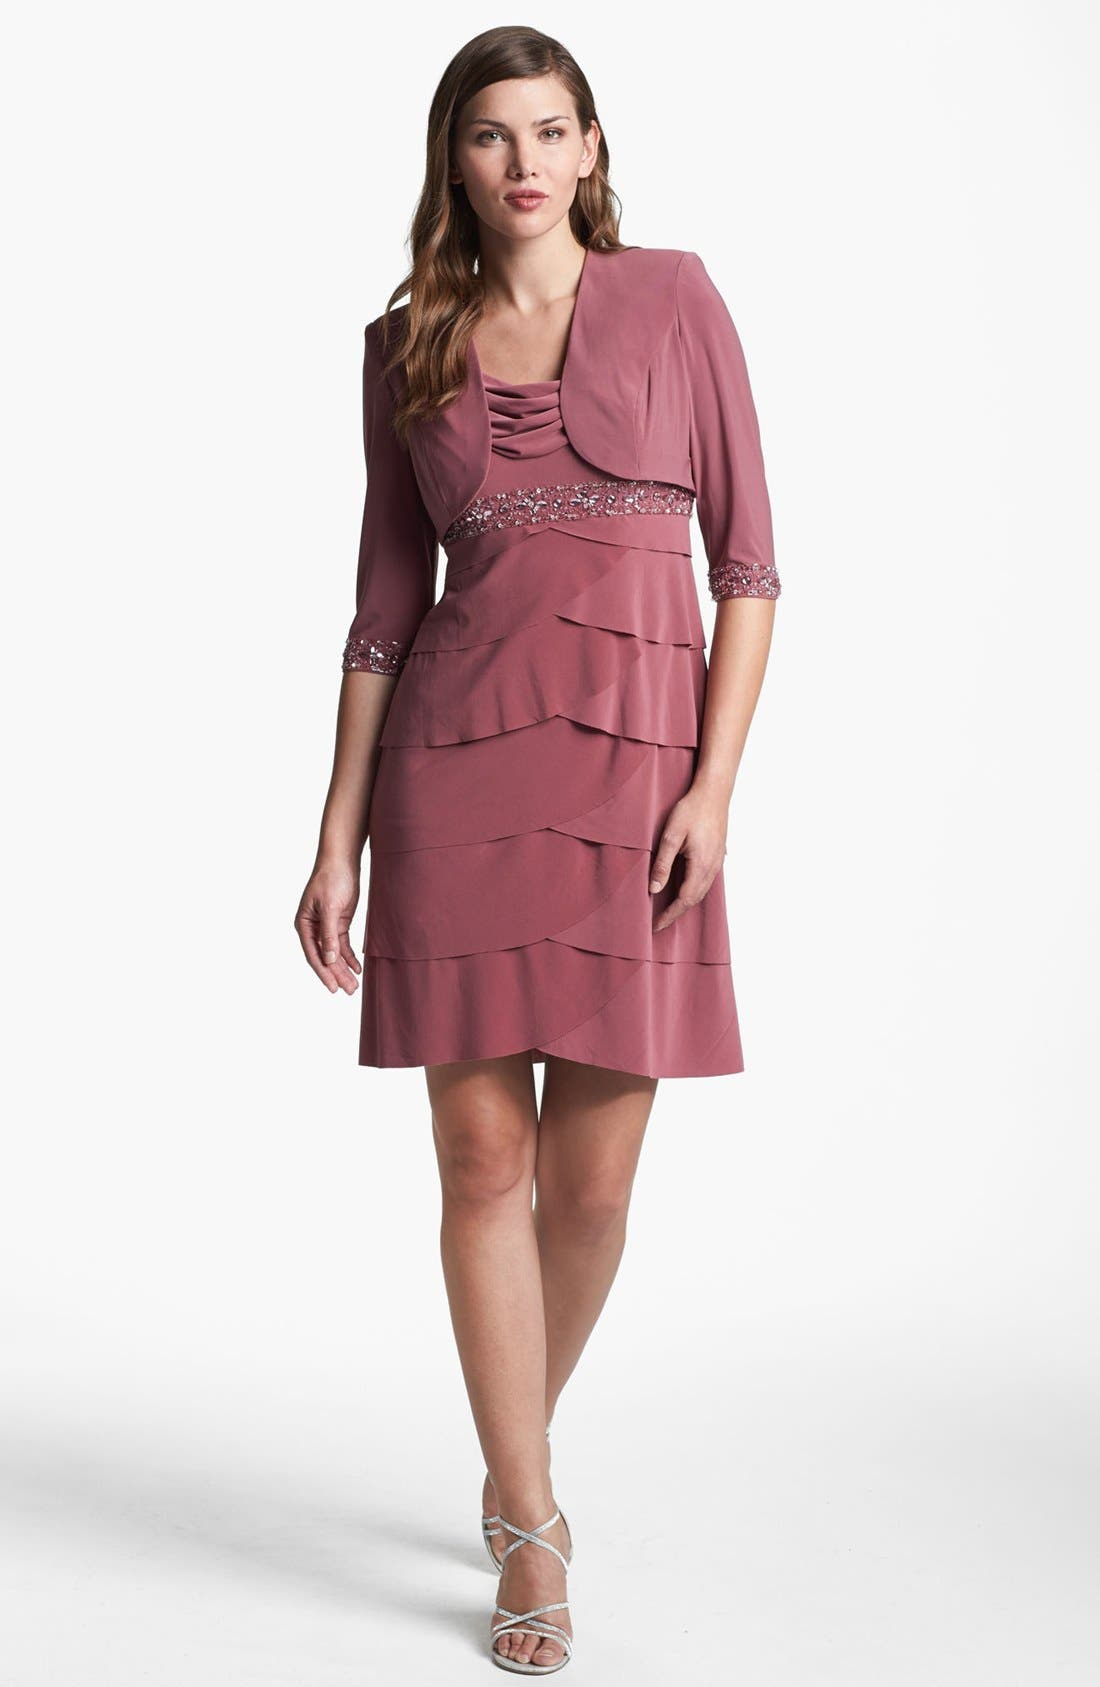 Alternate Image 1 Selected - Alex Evenings Tiered Dress & Bolero (Petite)